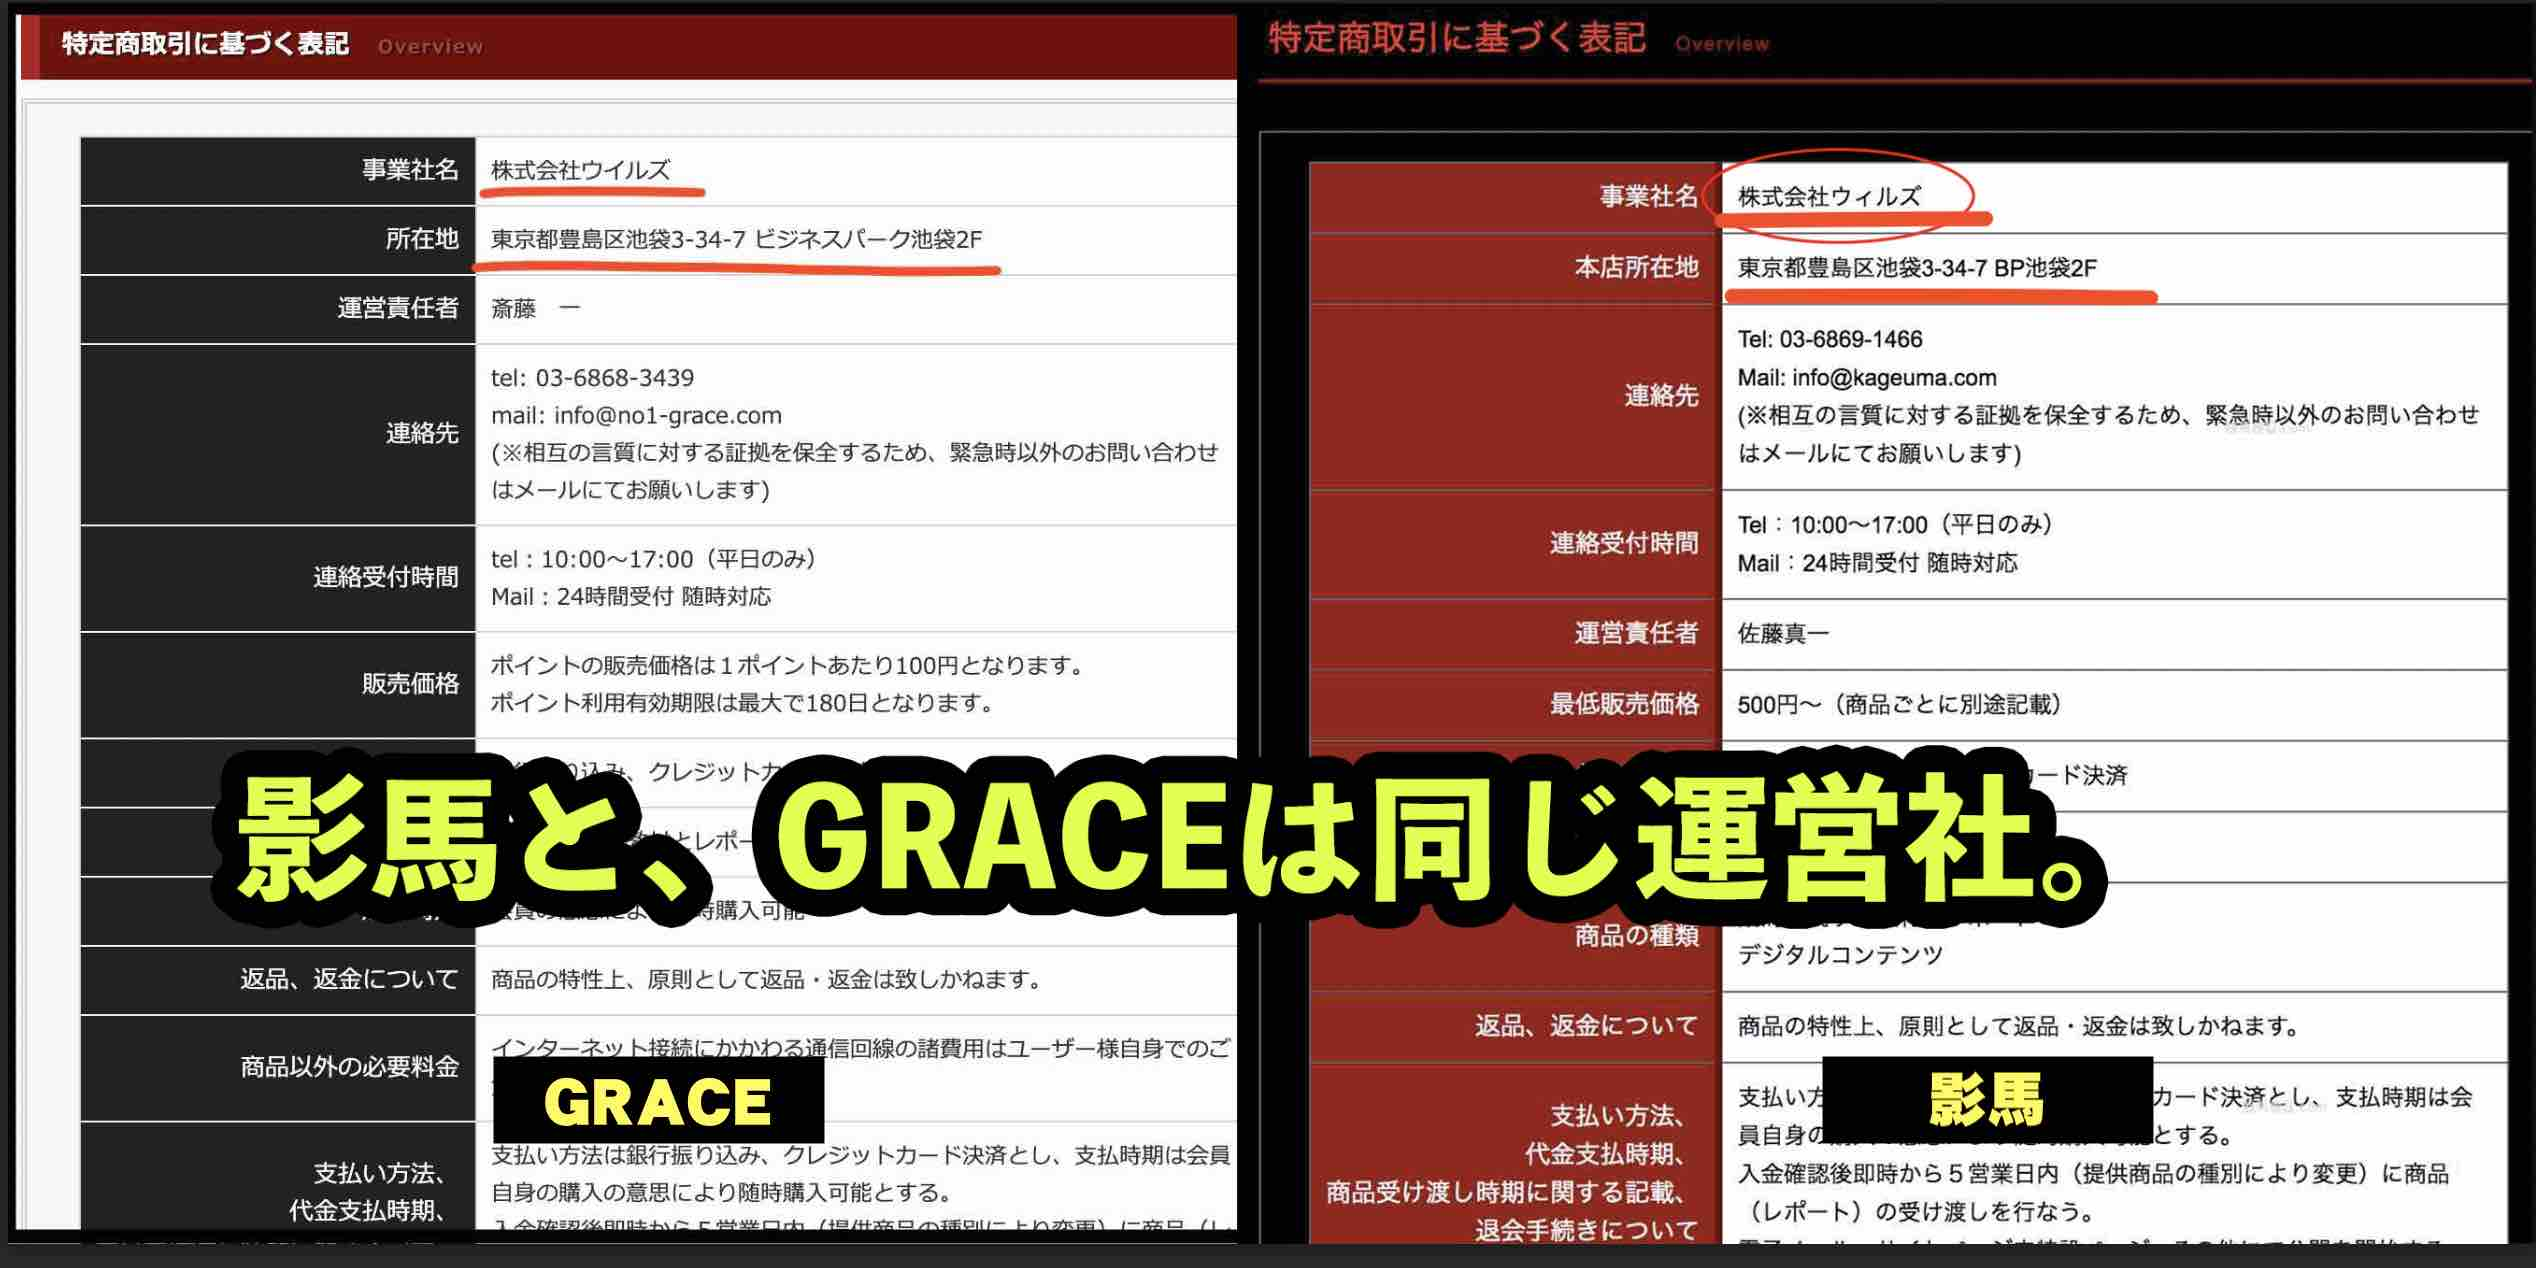 GRACE(グレイス)という競馬予想サイトは影馬と同じ運営